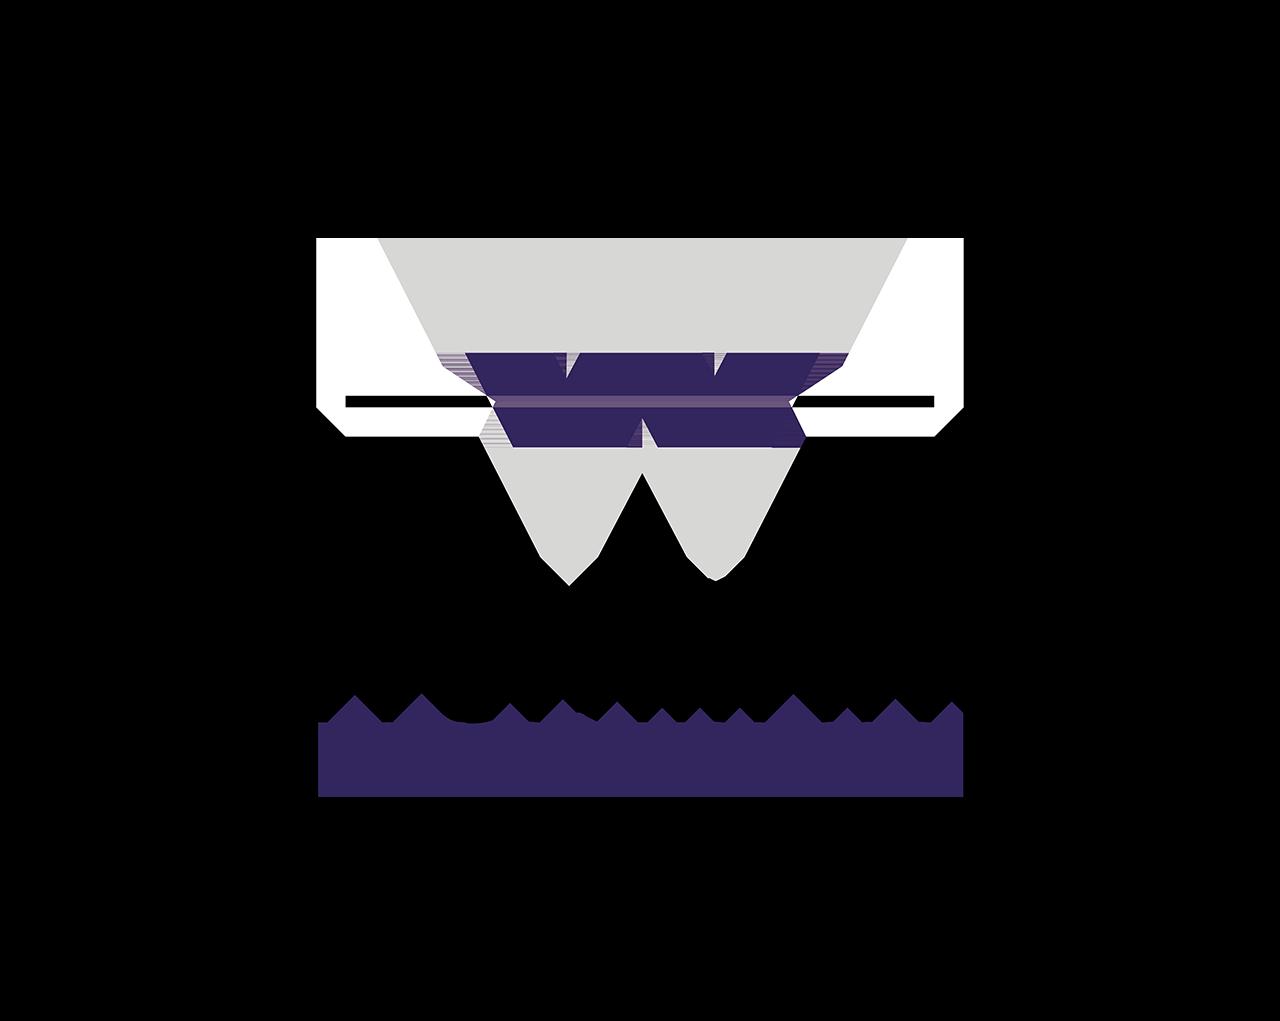 Wichmann Brandschutzsysteme GmbH & Co. KG